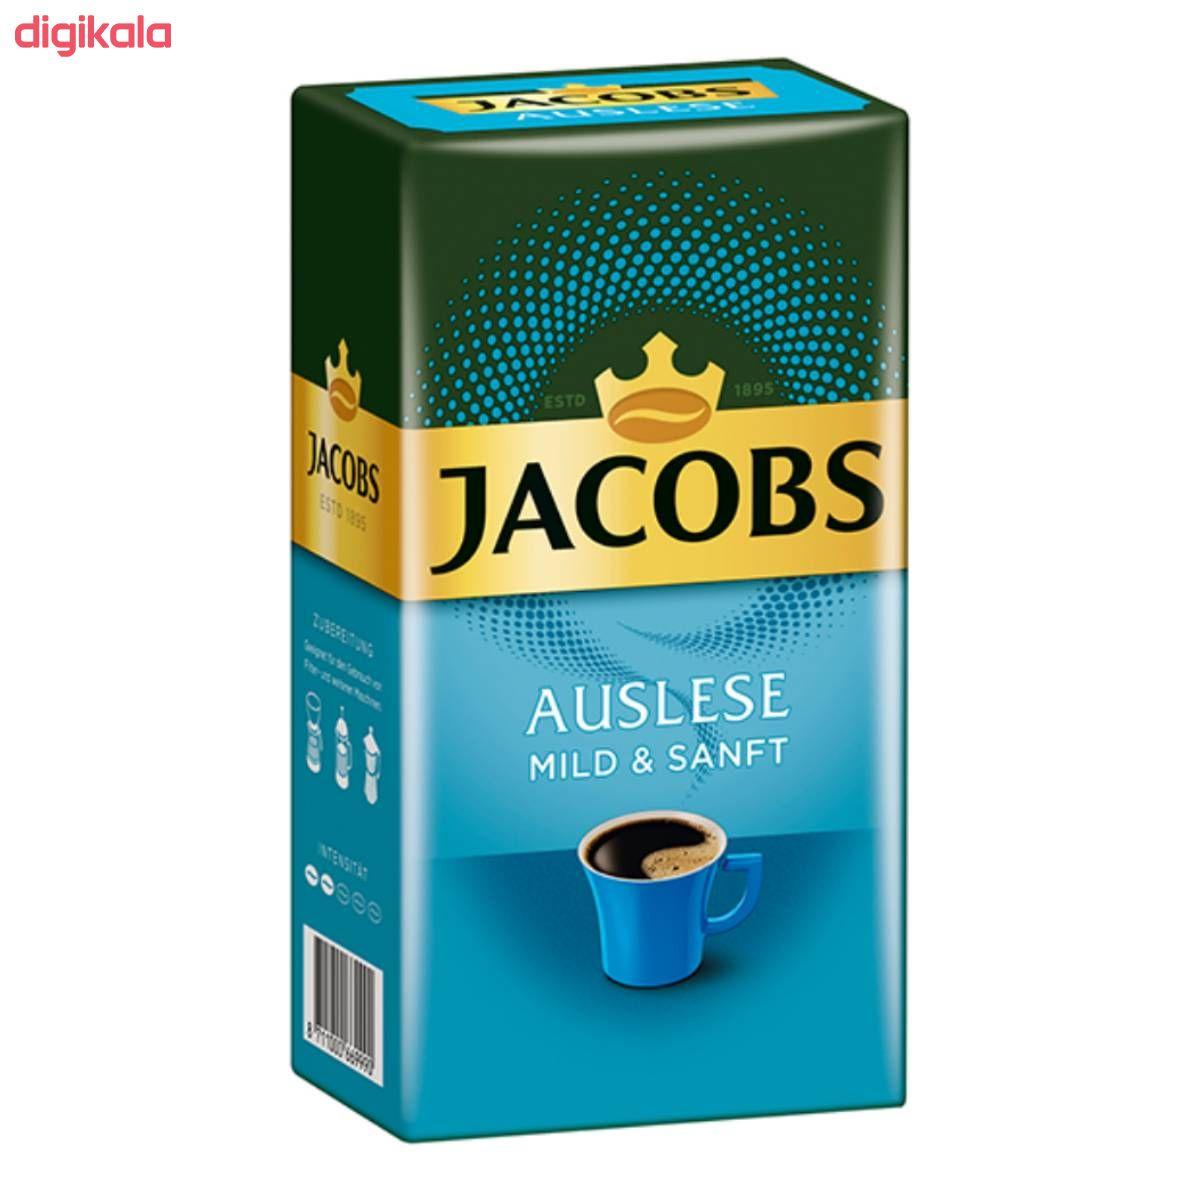 پودر قهوه آوسلیز مایلد جاکوبز - ۵۰۰ گرم main 1 1